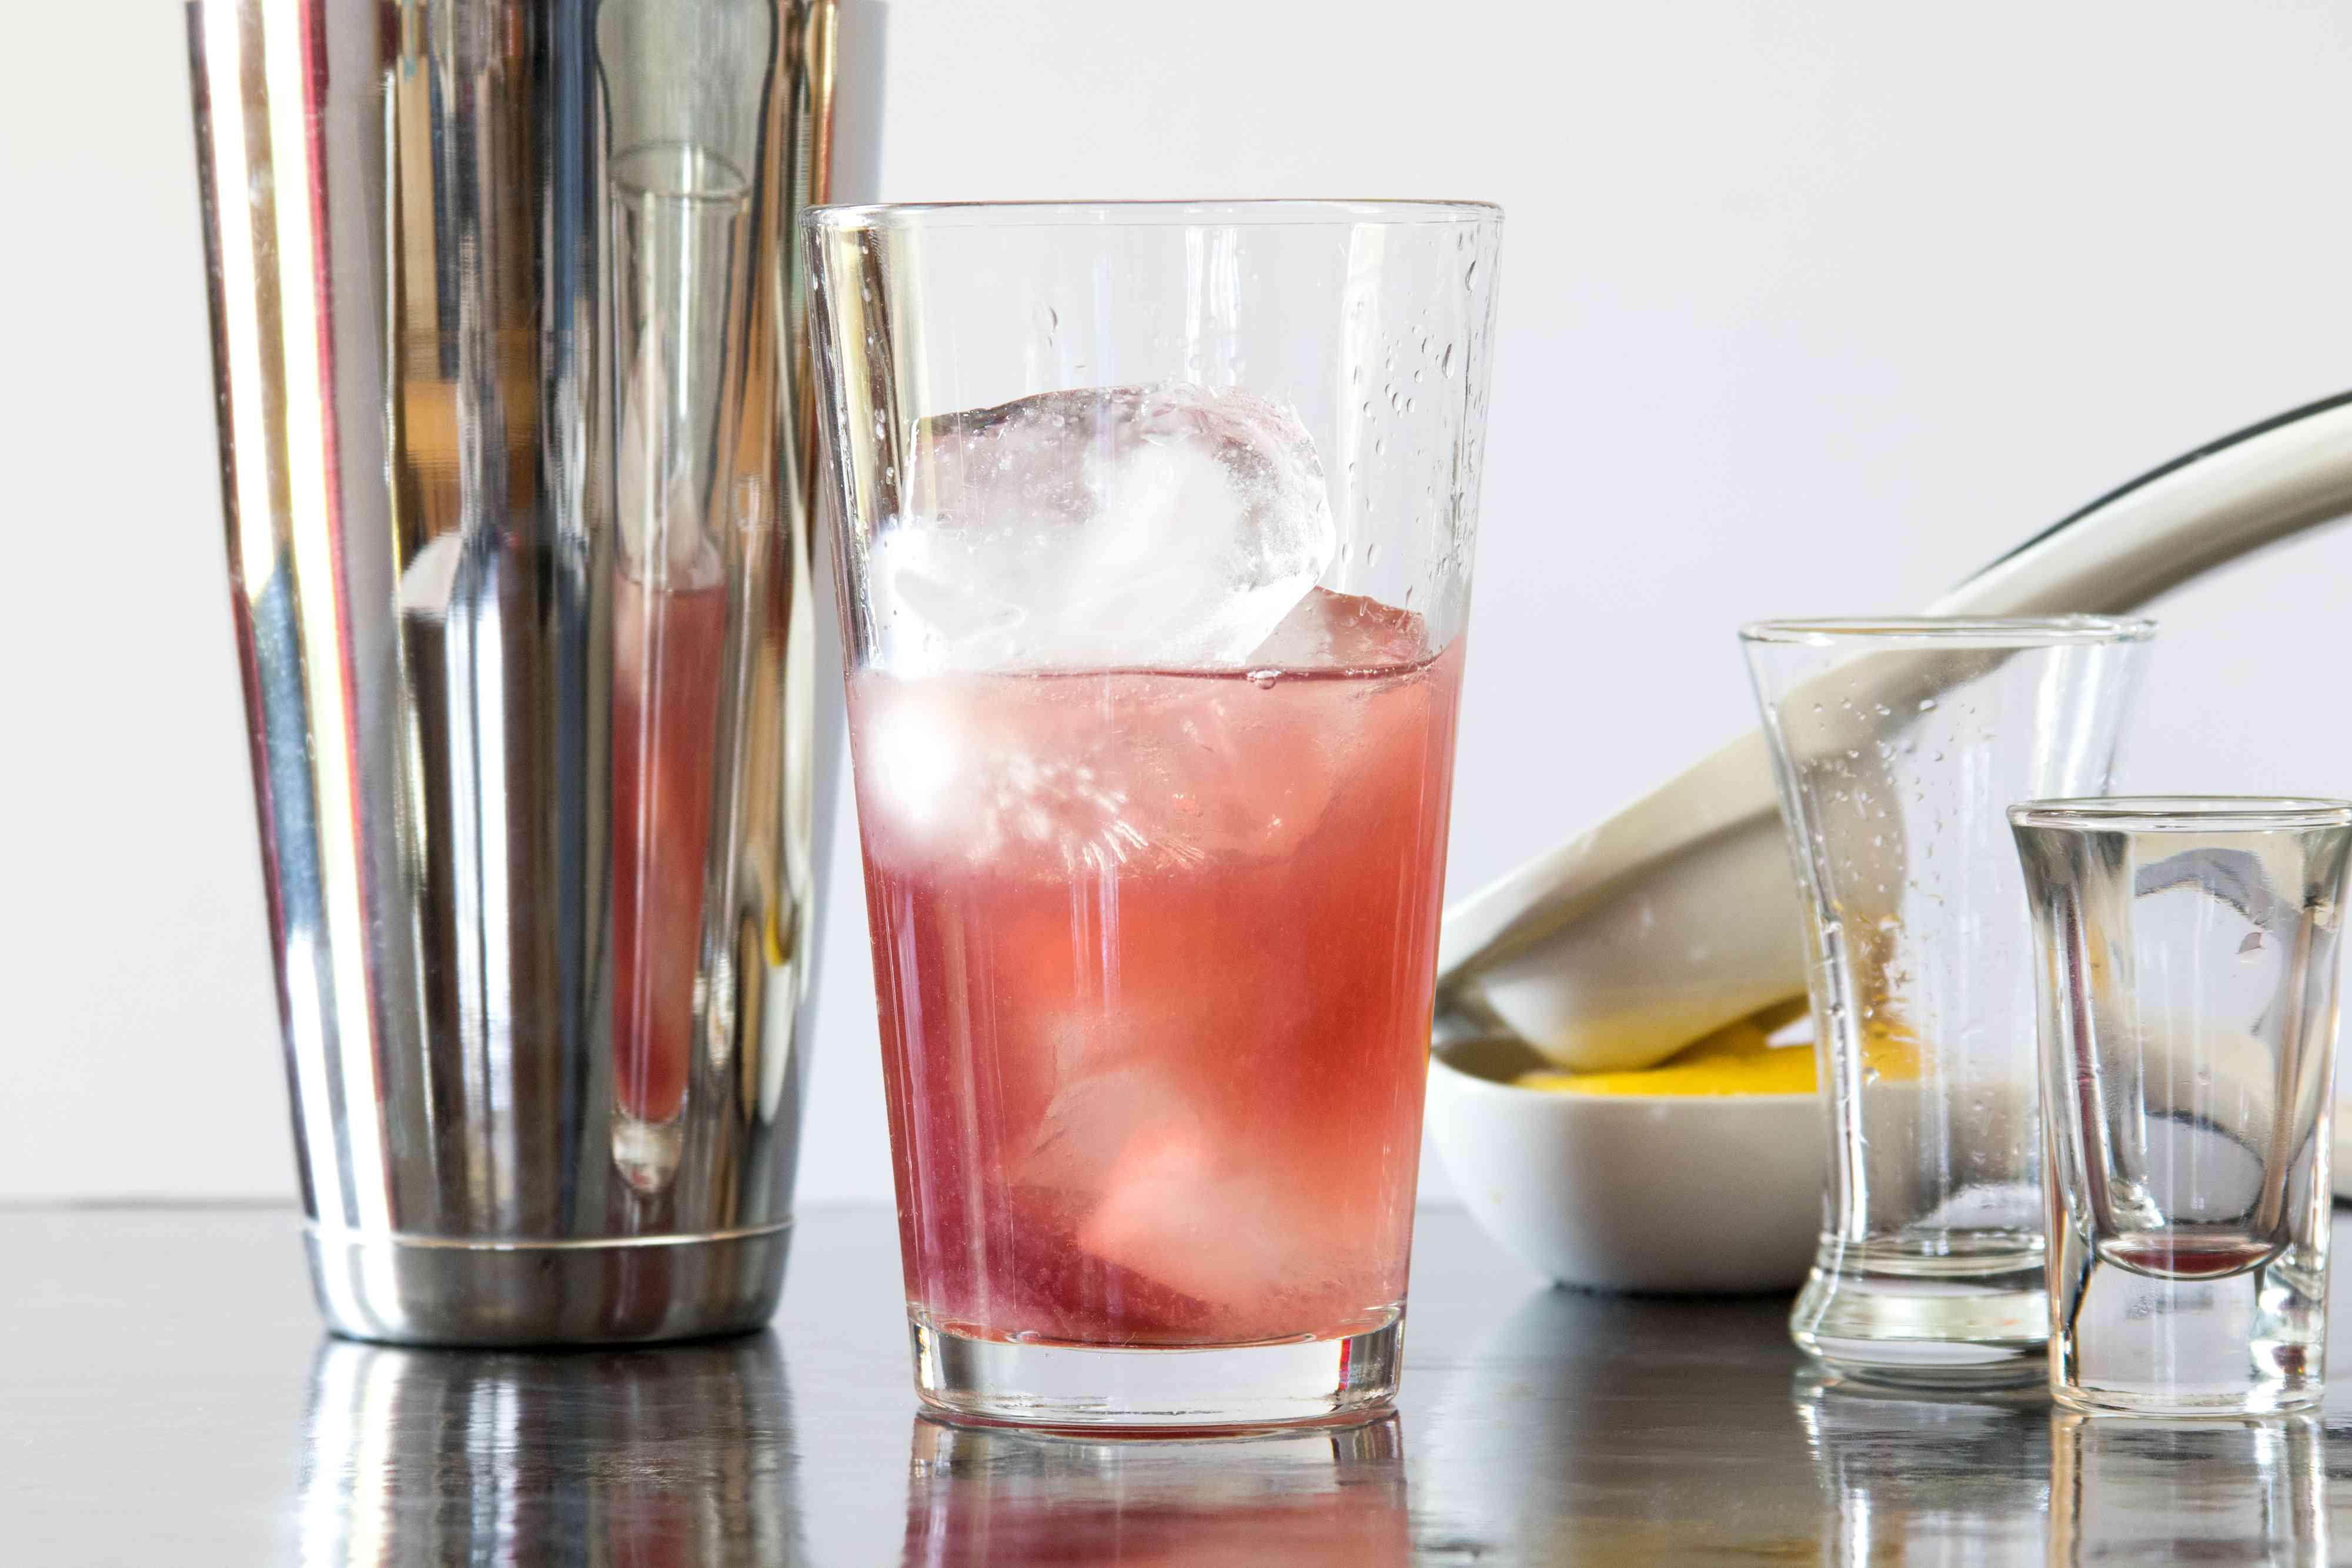 Mixing a Pomegranate Martini